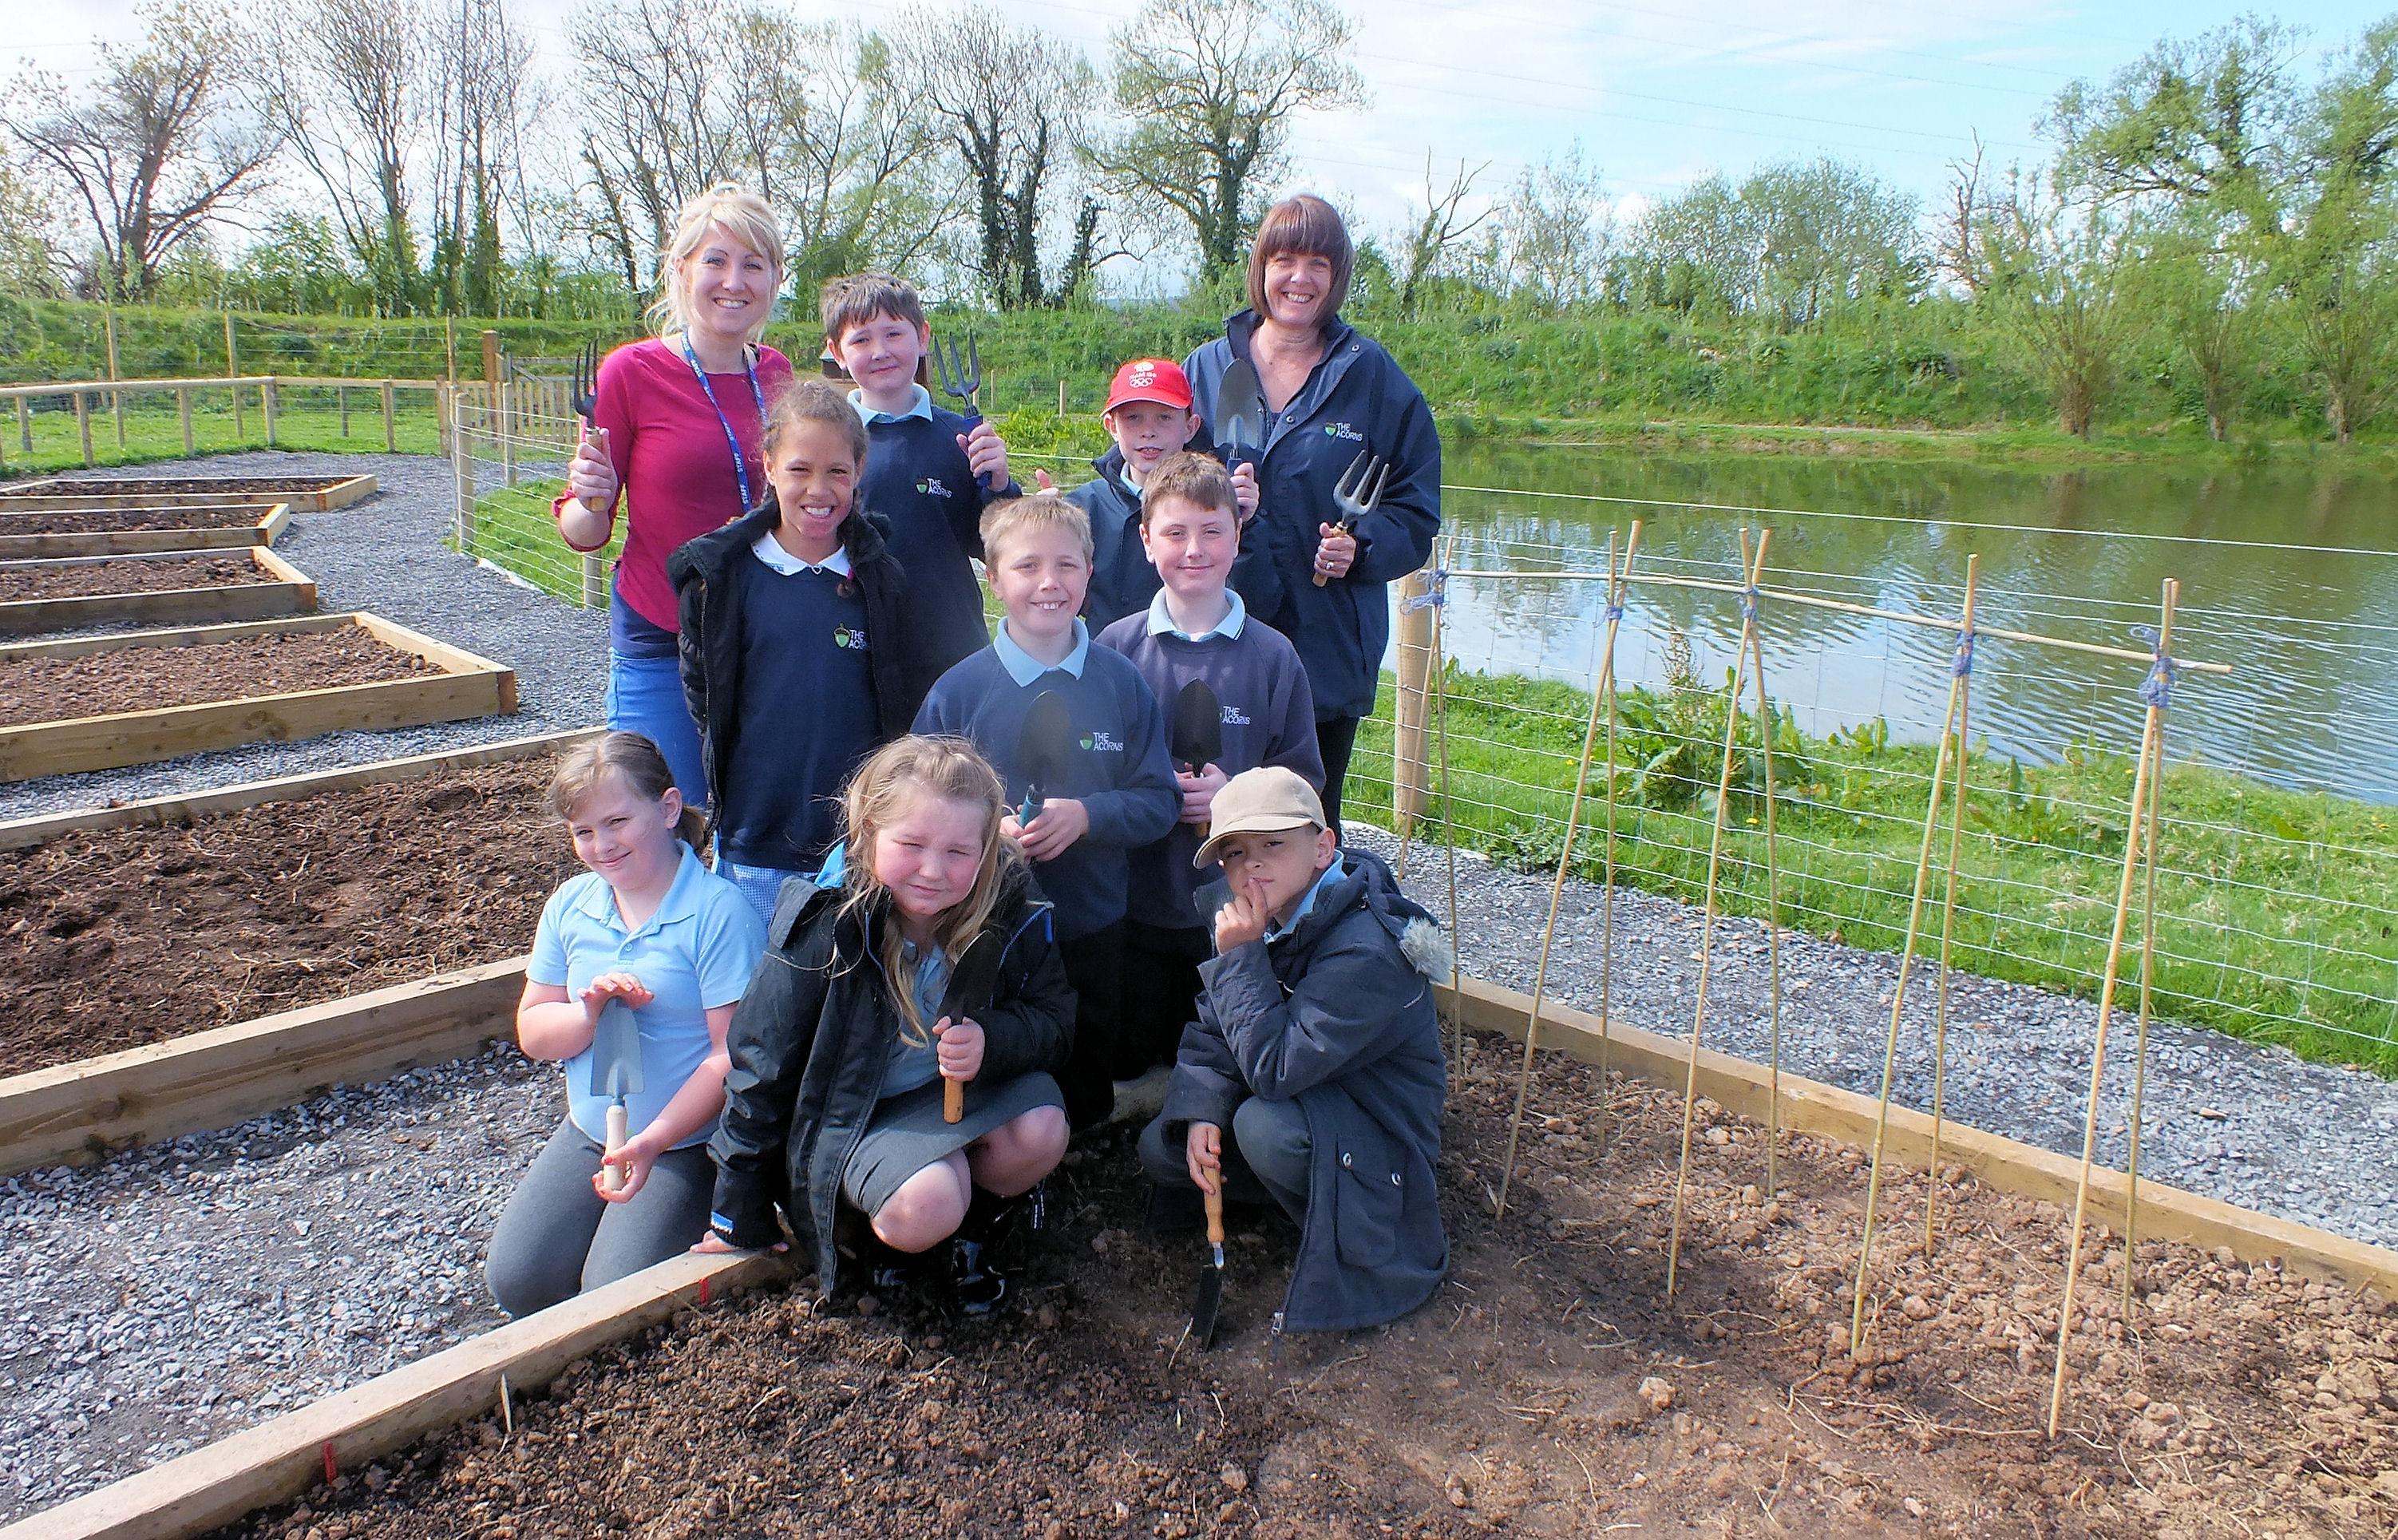 Pupils visit allotment to plant seeds